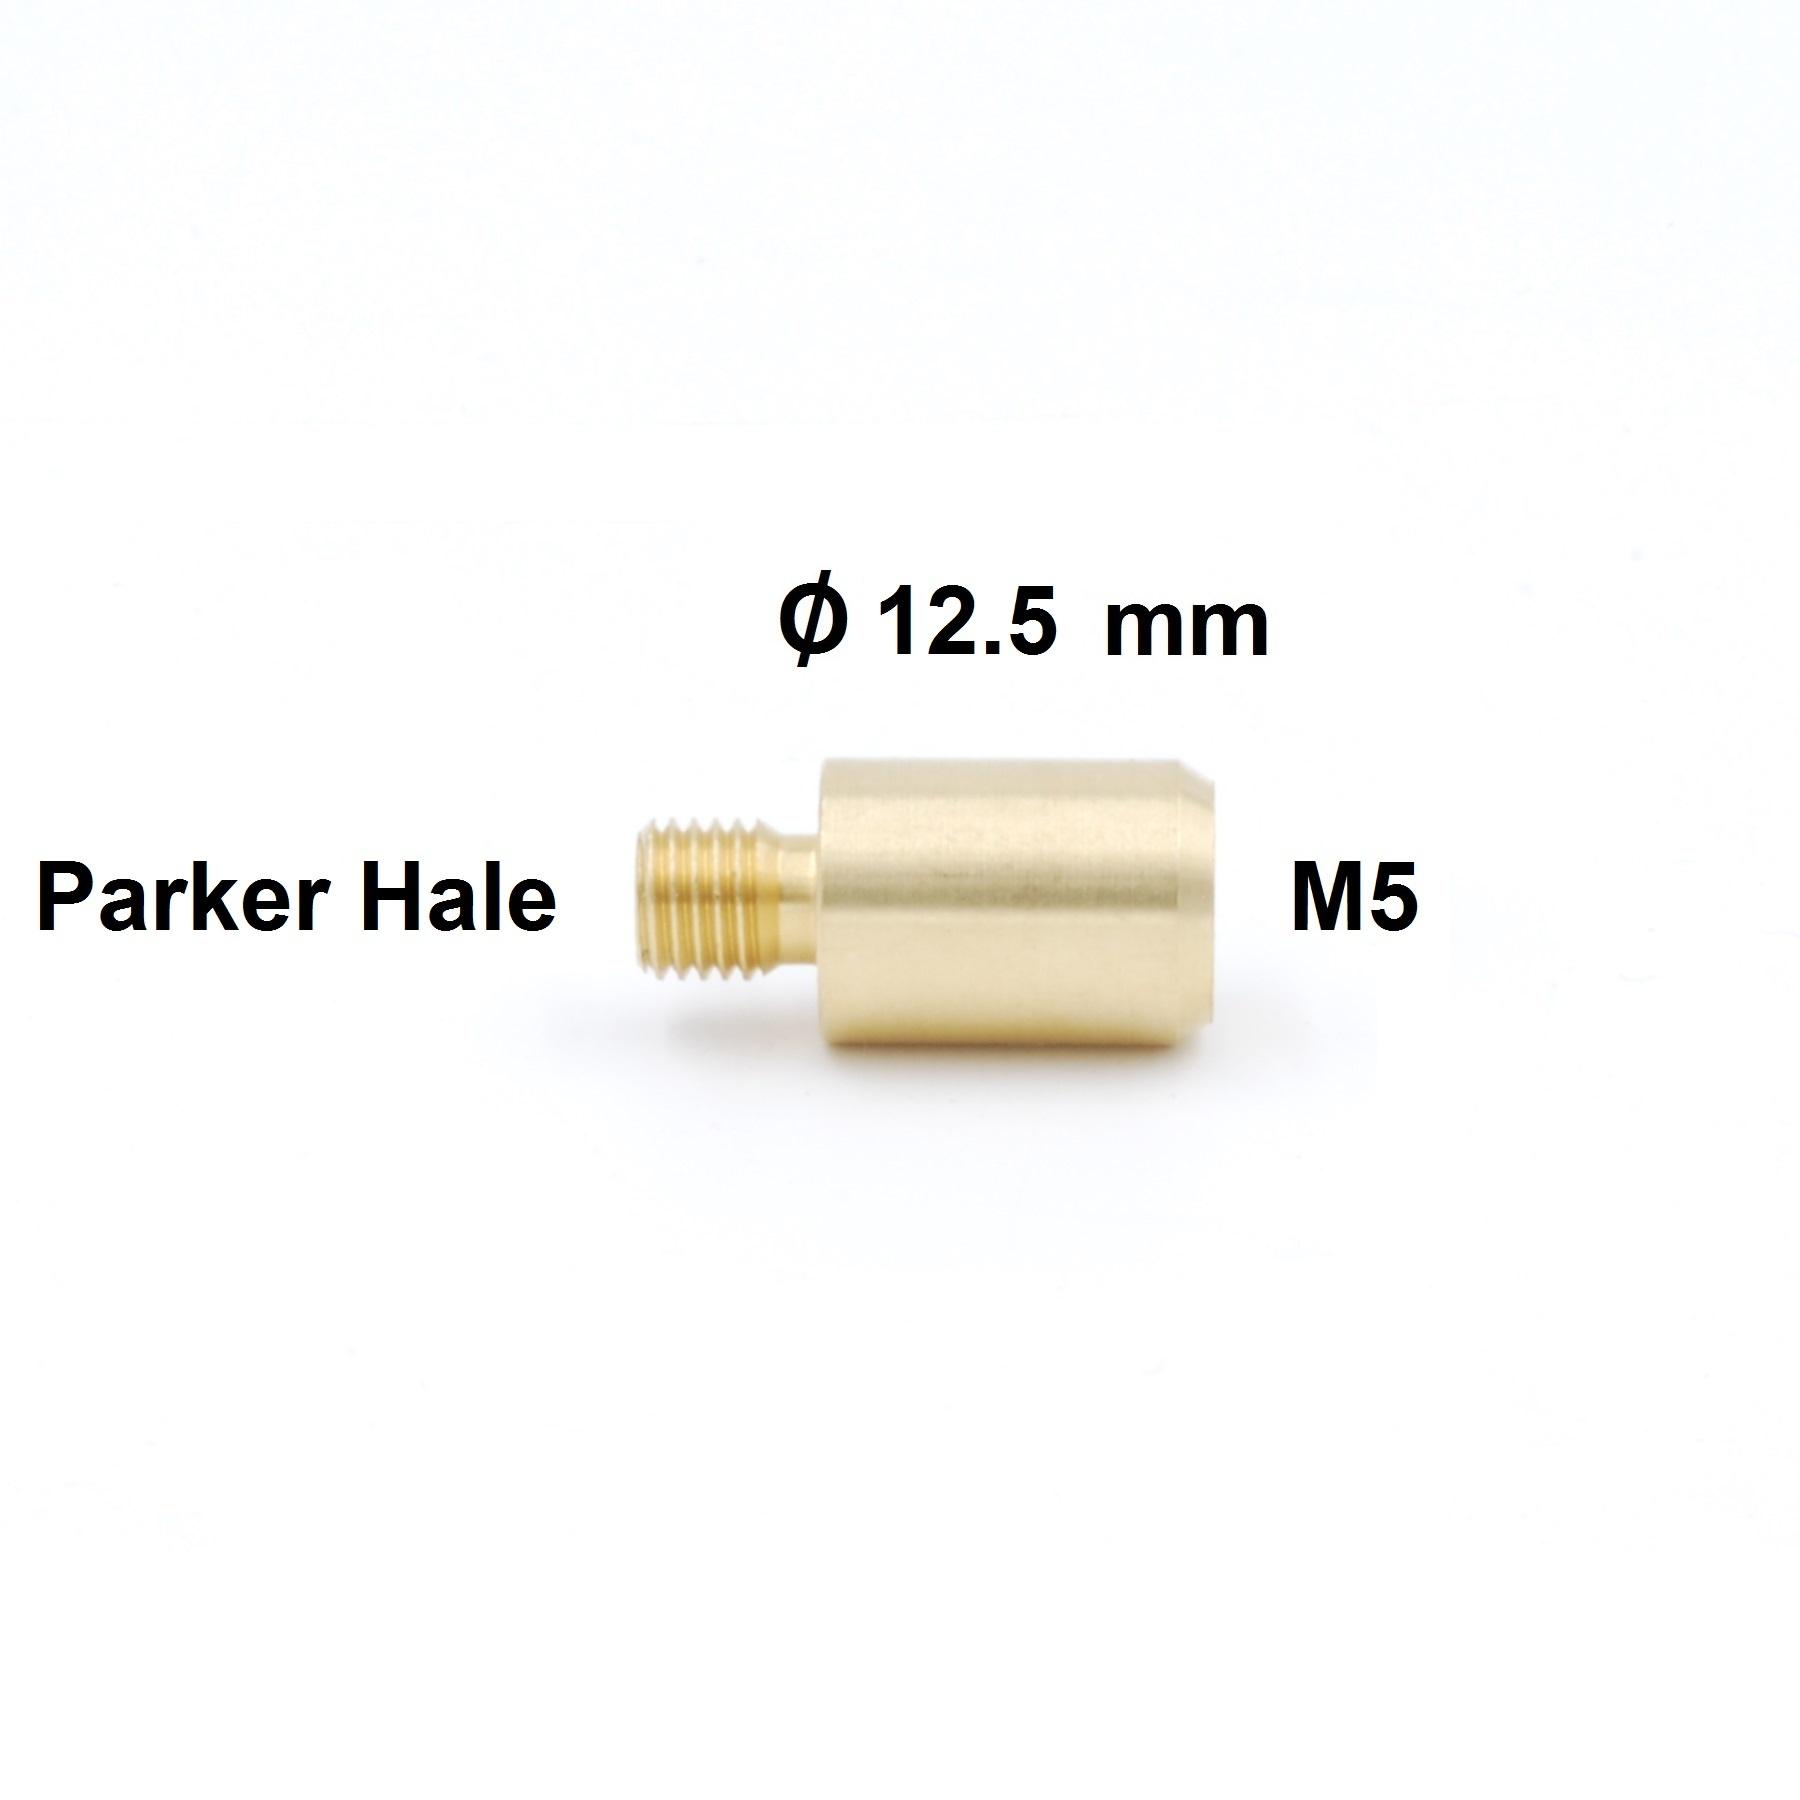 Ballistol Poetsstok Adapter Parker Hale  buitendraad  naar M5 binnendraad